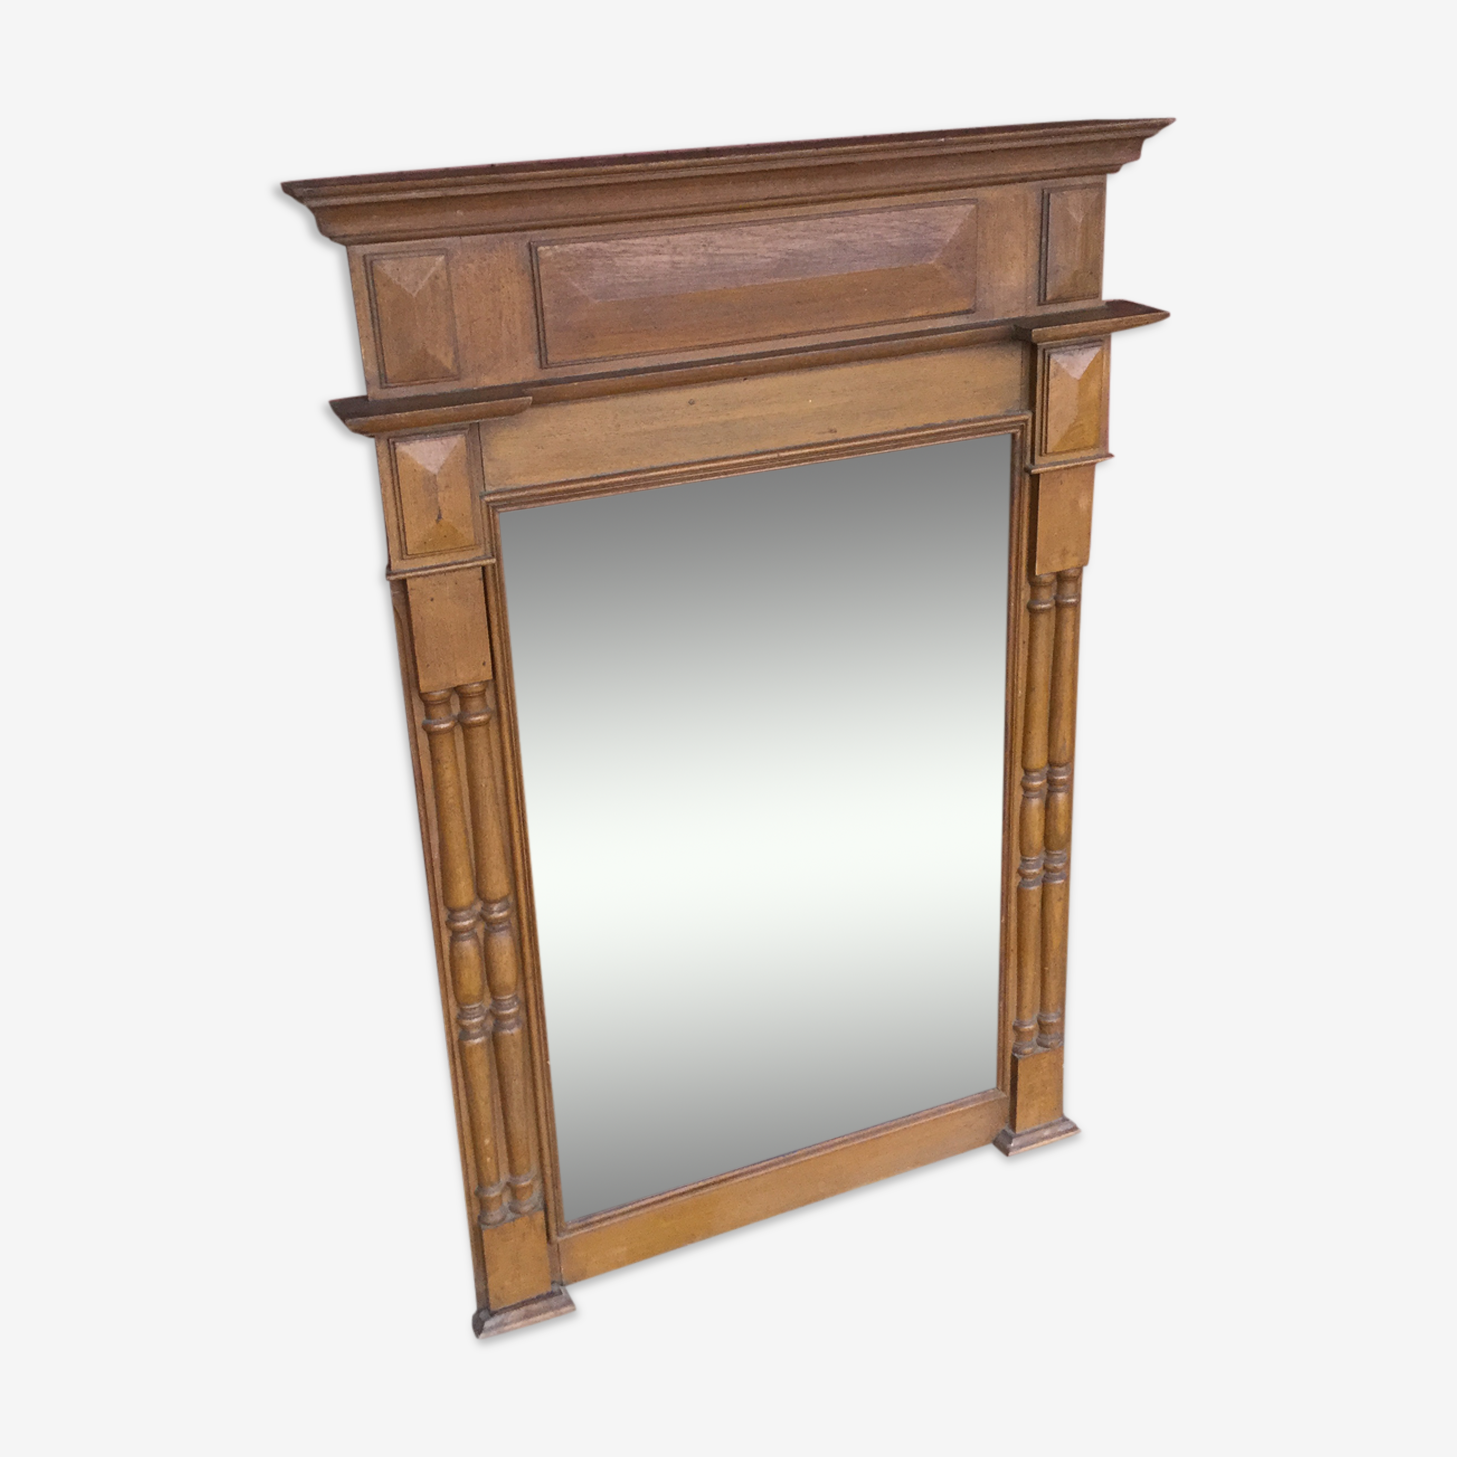 Miroir Henri ll 84x120cm